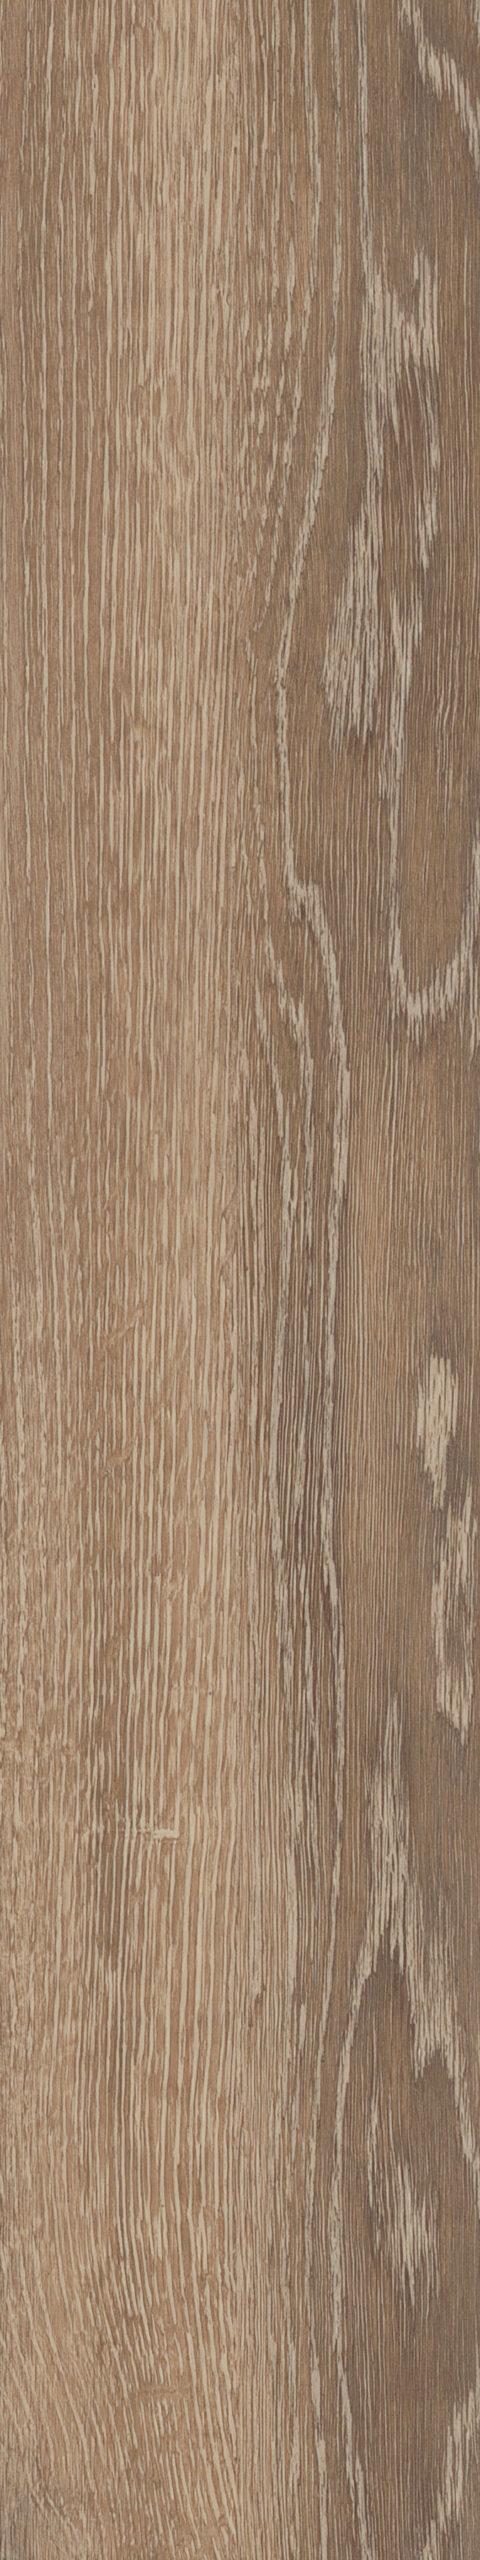 Parva Oak Calabria